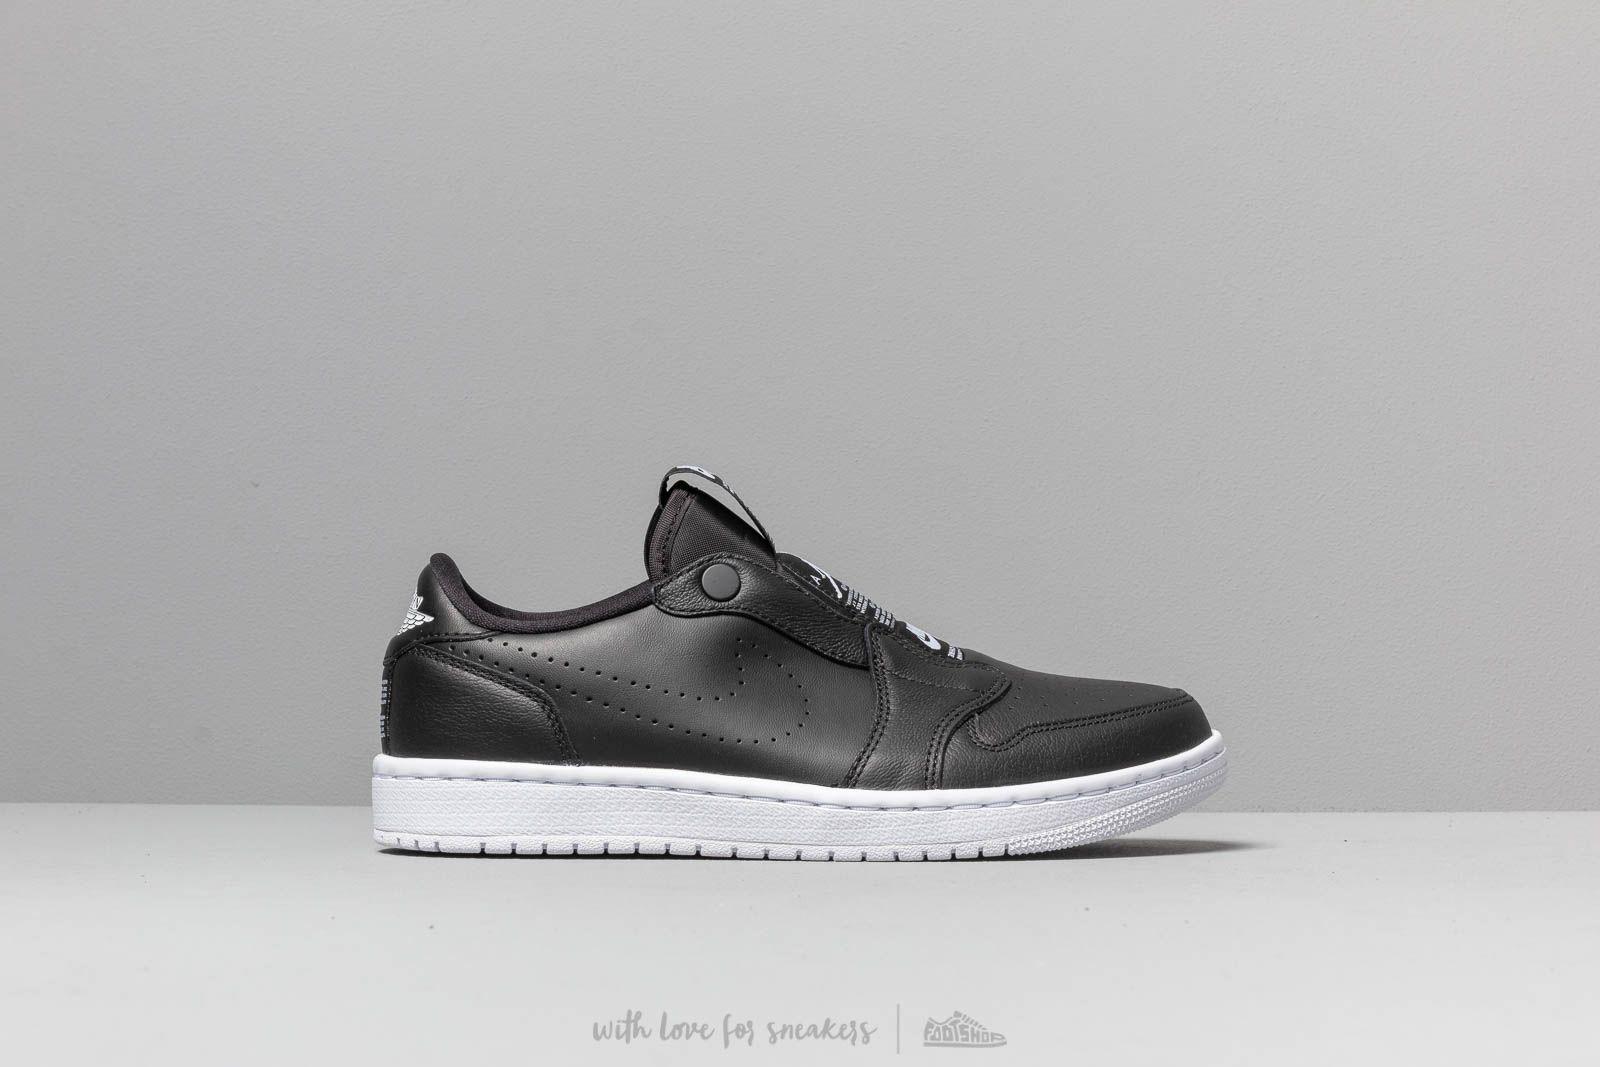 7bb513425 Air Jordan Wmns 1 Ret Low Slip Black  White at a great price 84 €